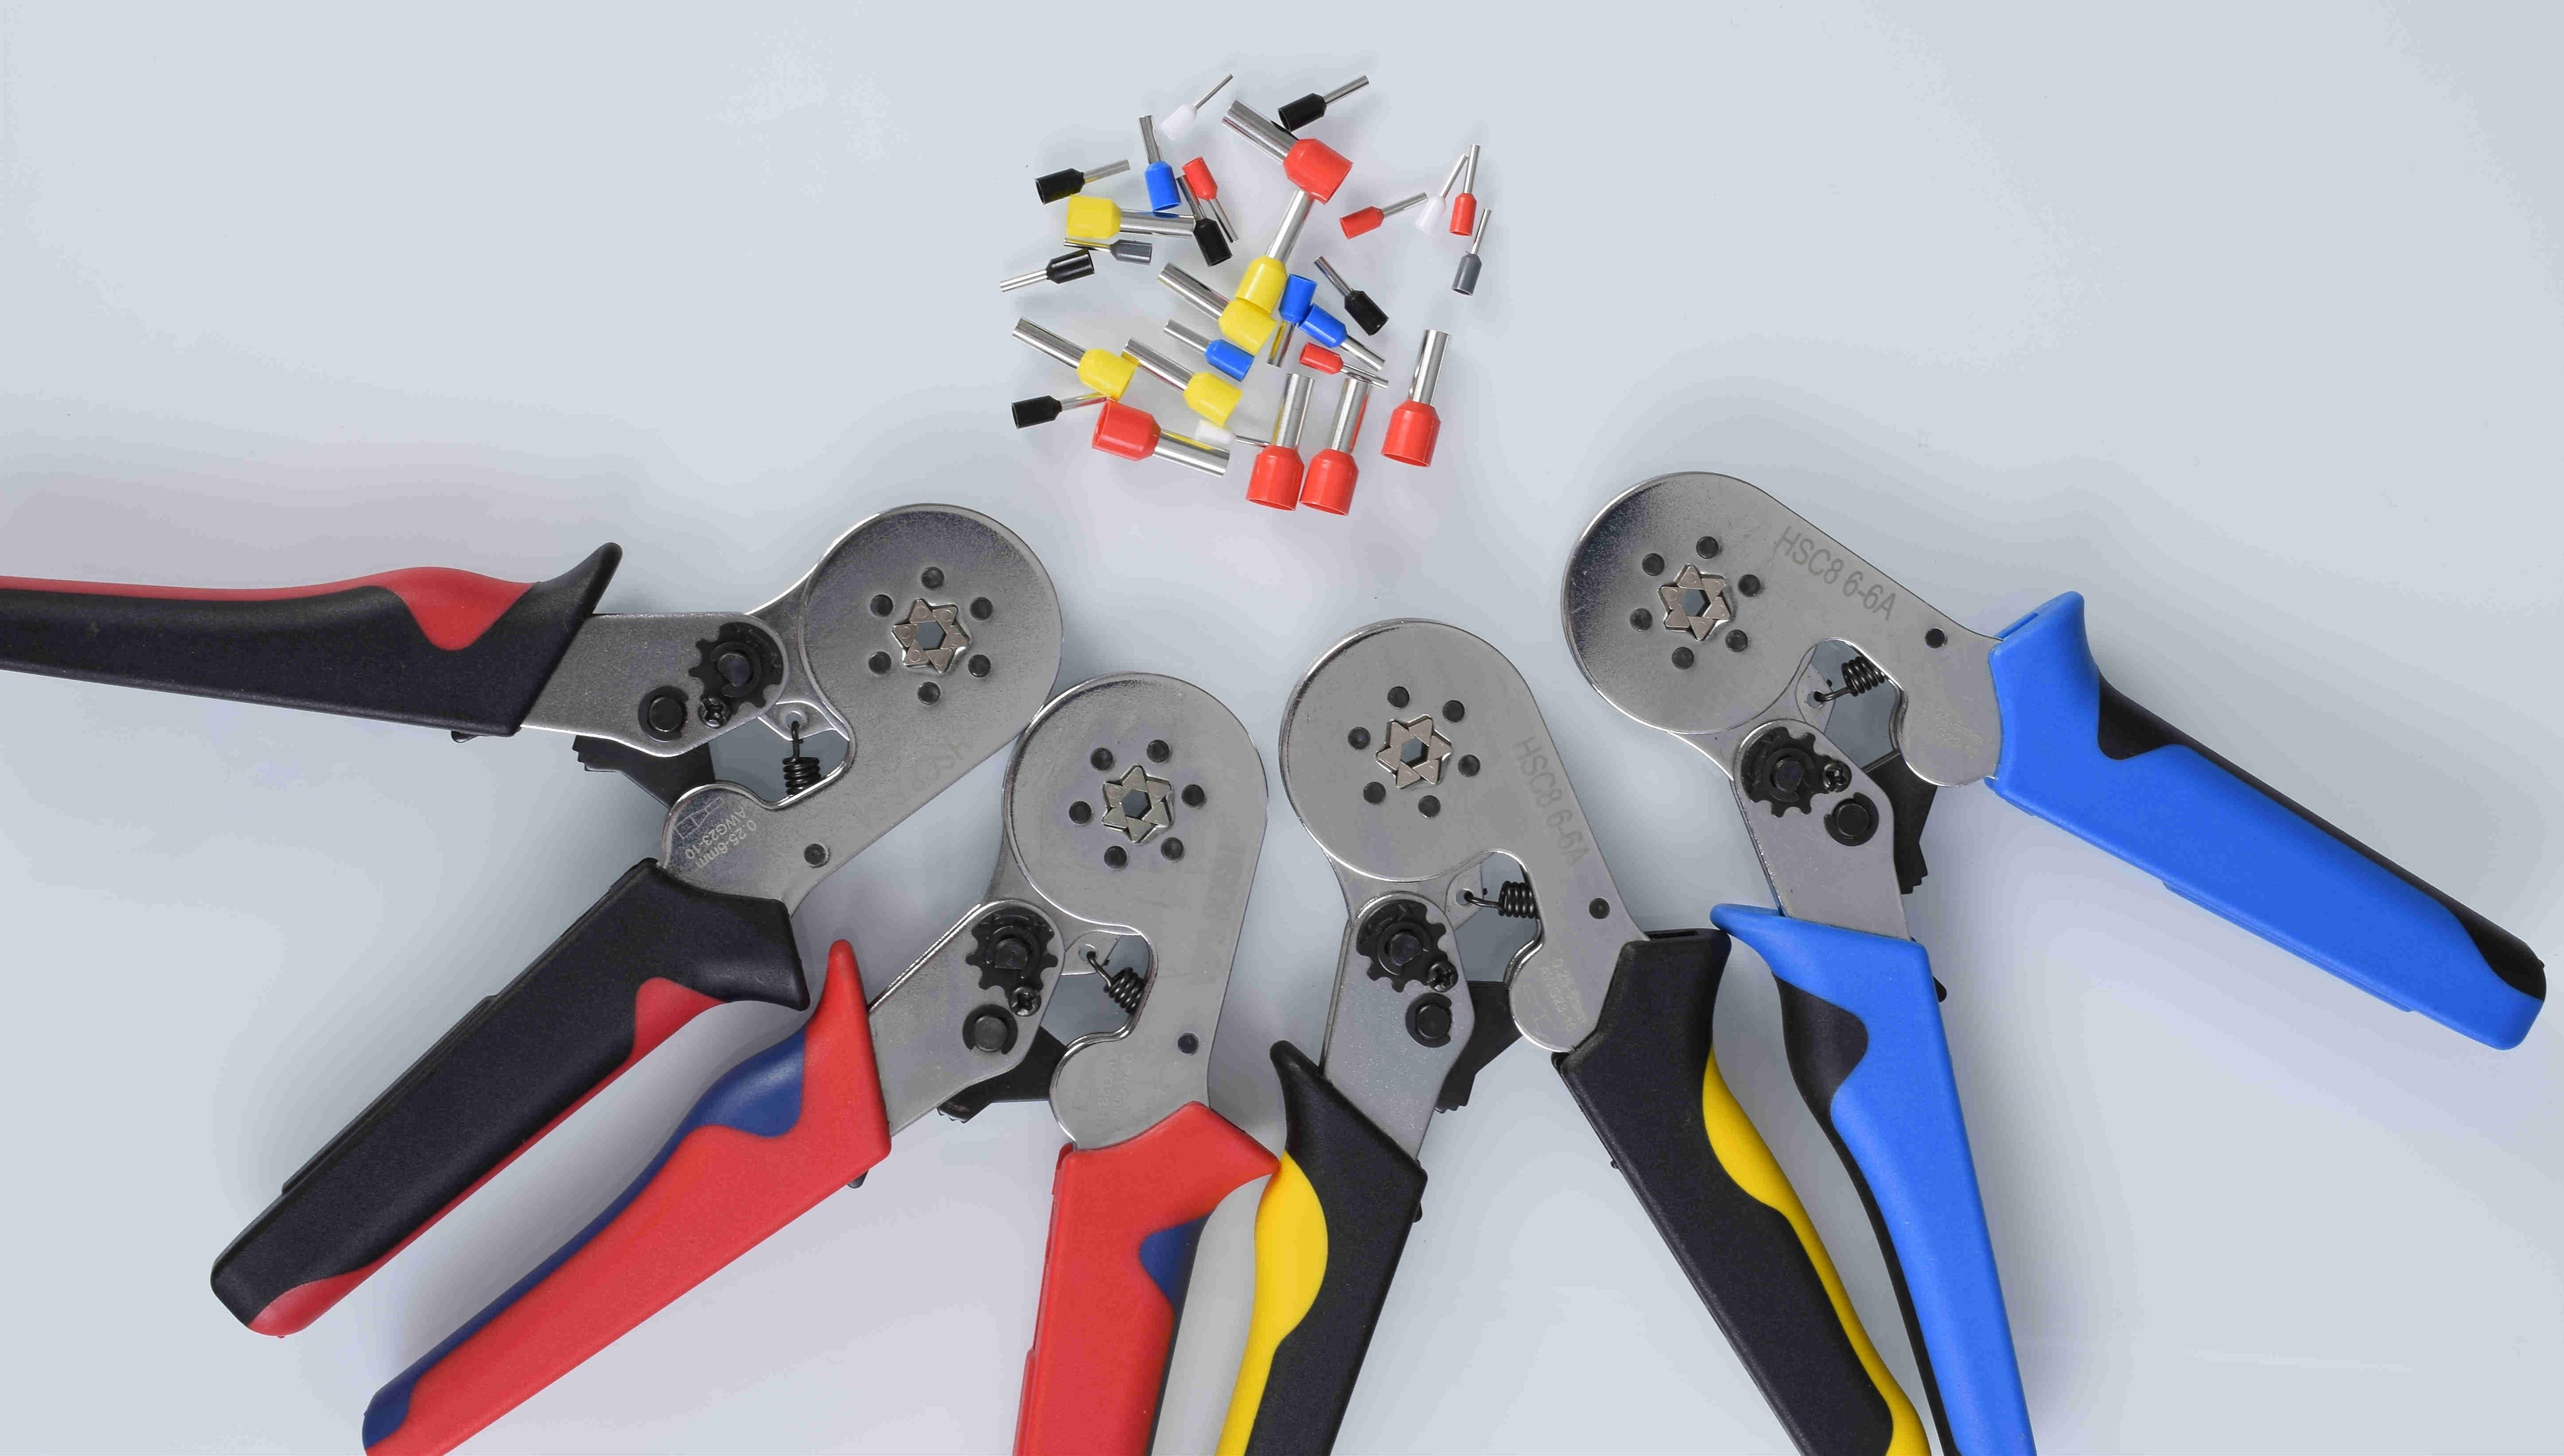 Ferrule crimping tool kit-TOOZO ferrule crimping pliers AWG 23-10 (0.25-6mm²) w / 1200pcs wire ferrule crimping wire end termina